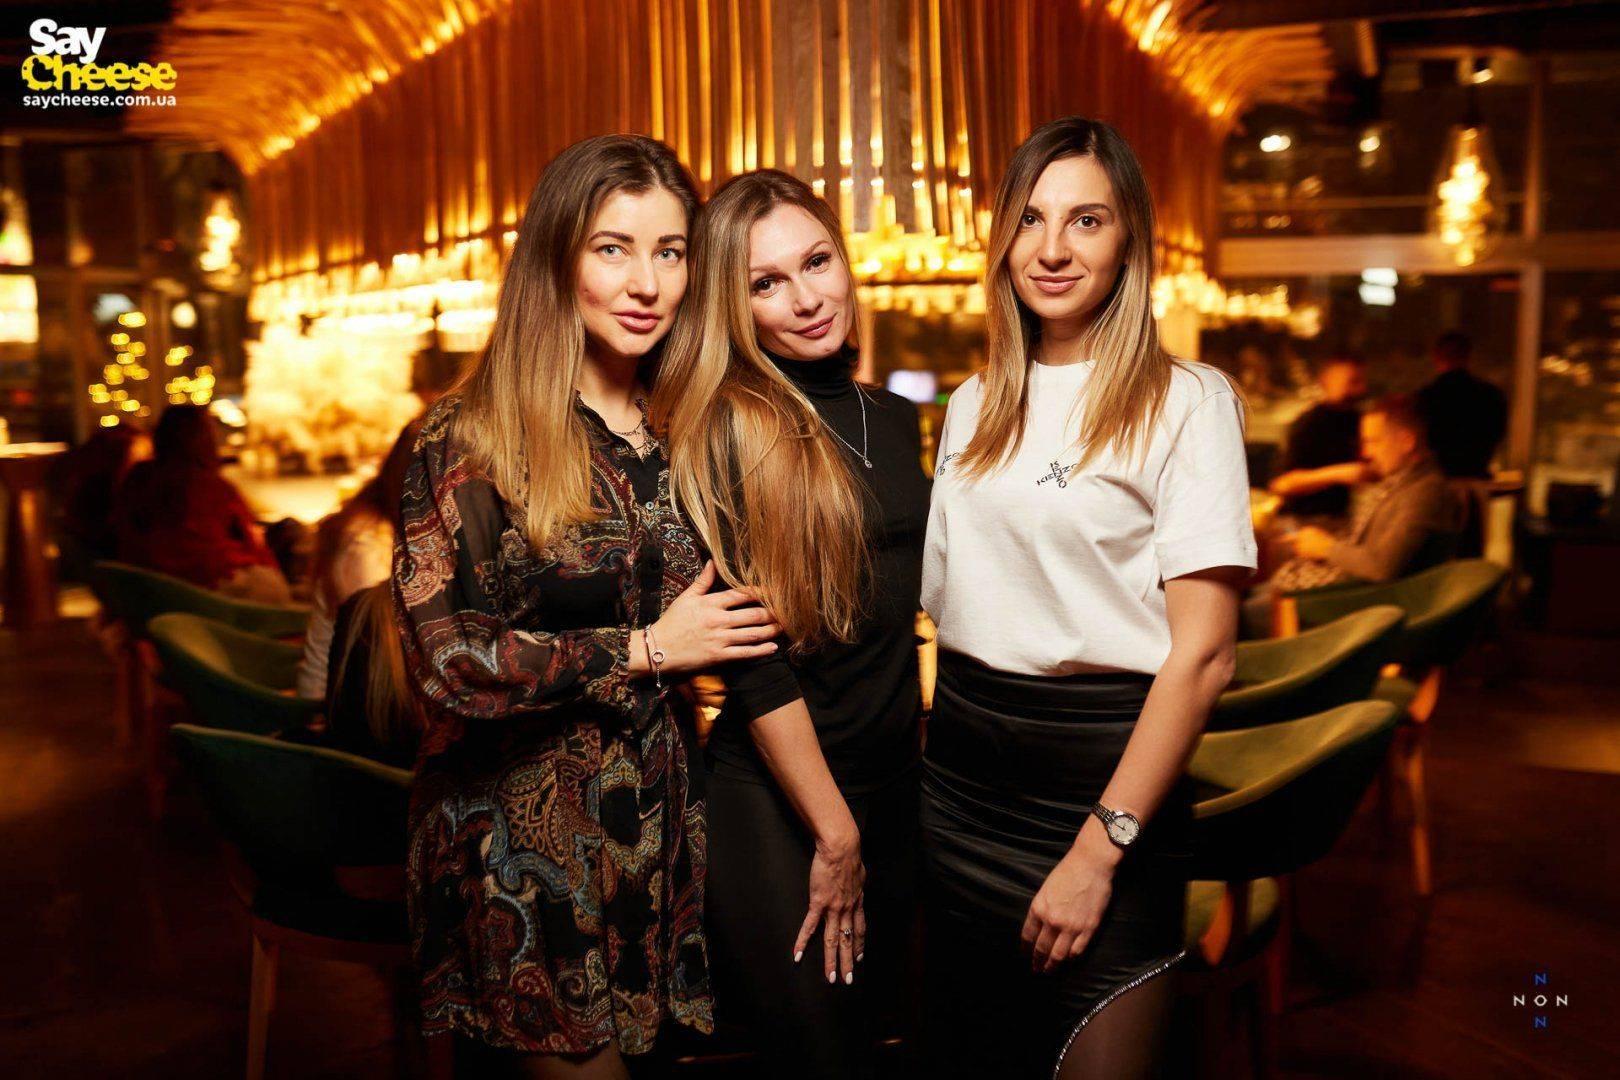 Ресторан NON Харьков фотоотчет Saycheese 29.01